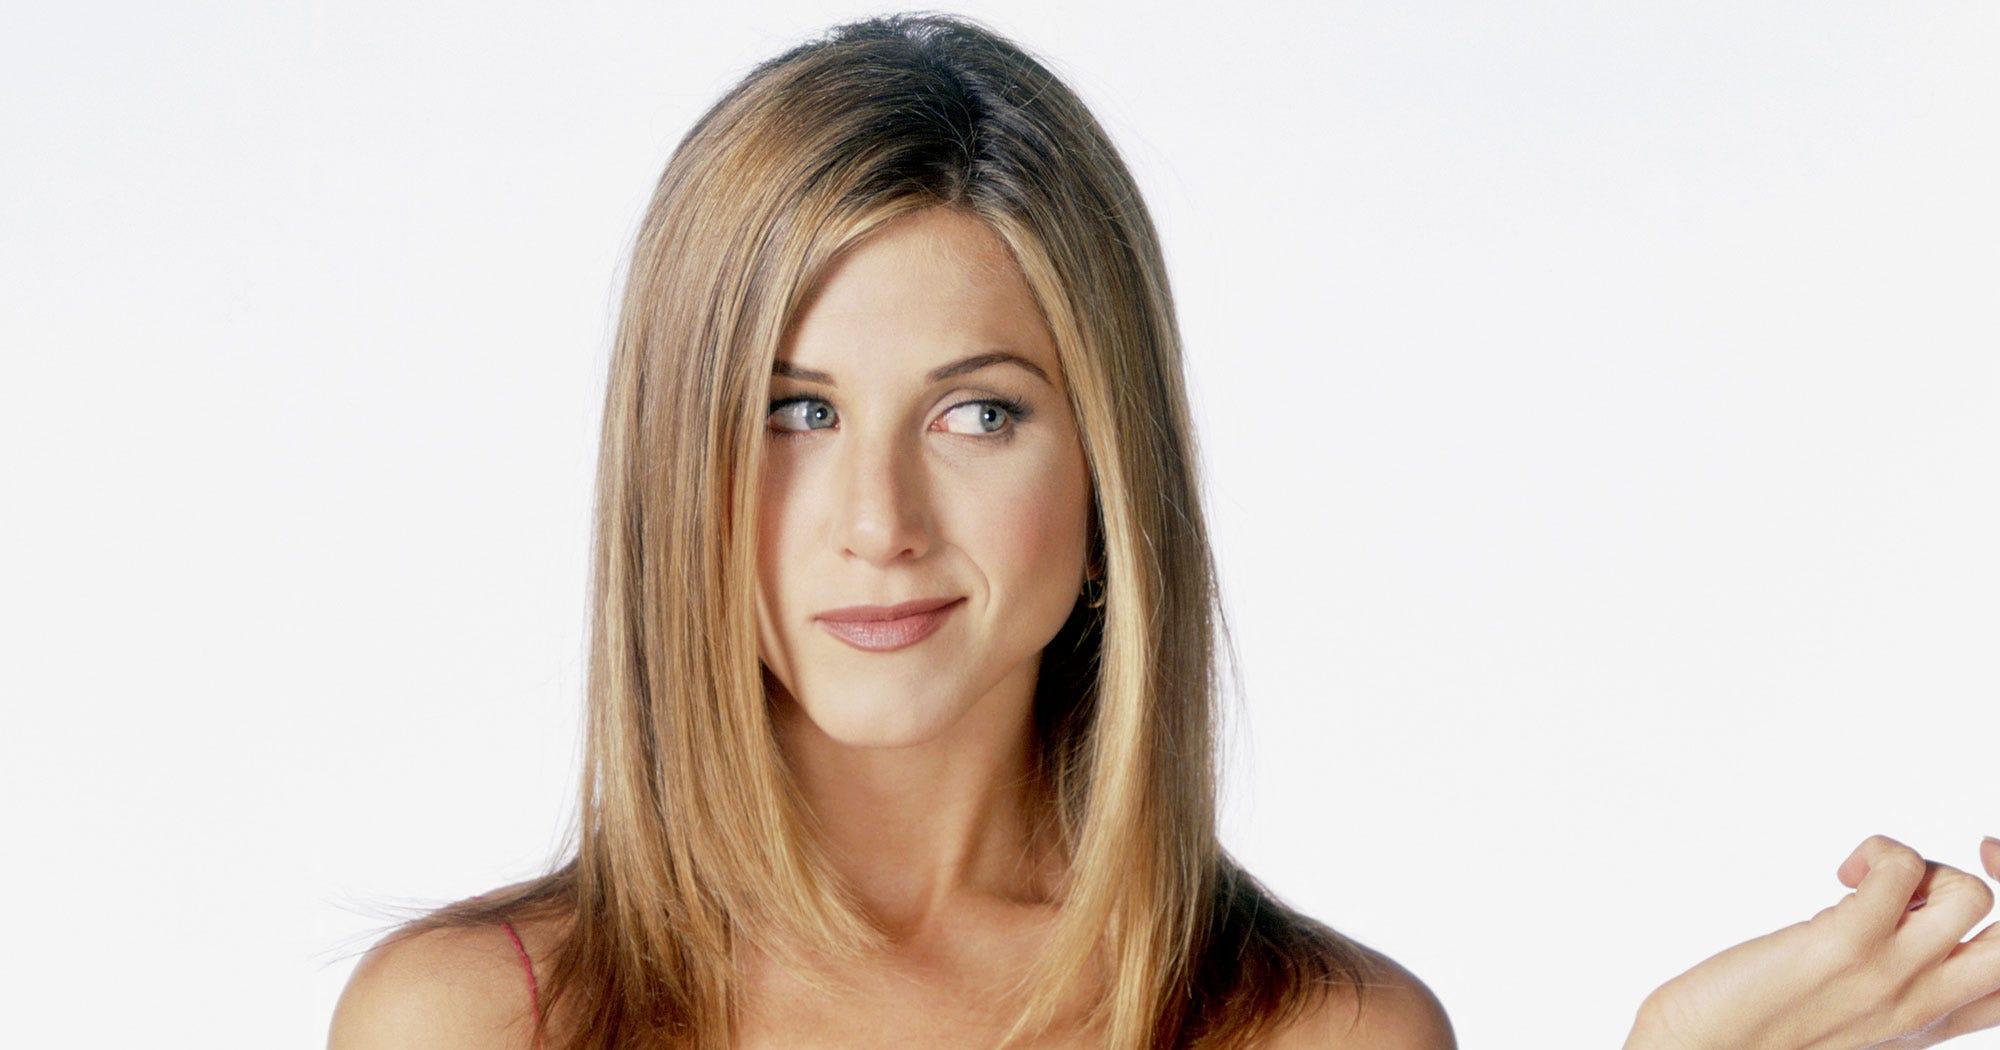 Jennifer Aniston Hair Colorist Tips Rachel Friends